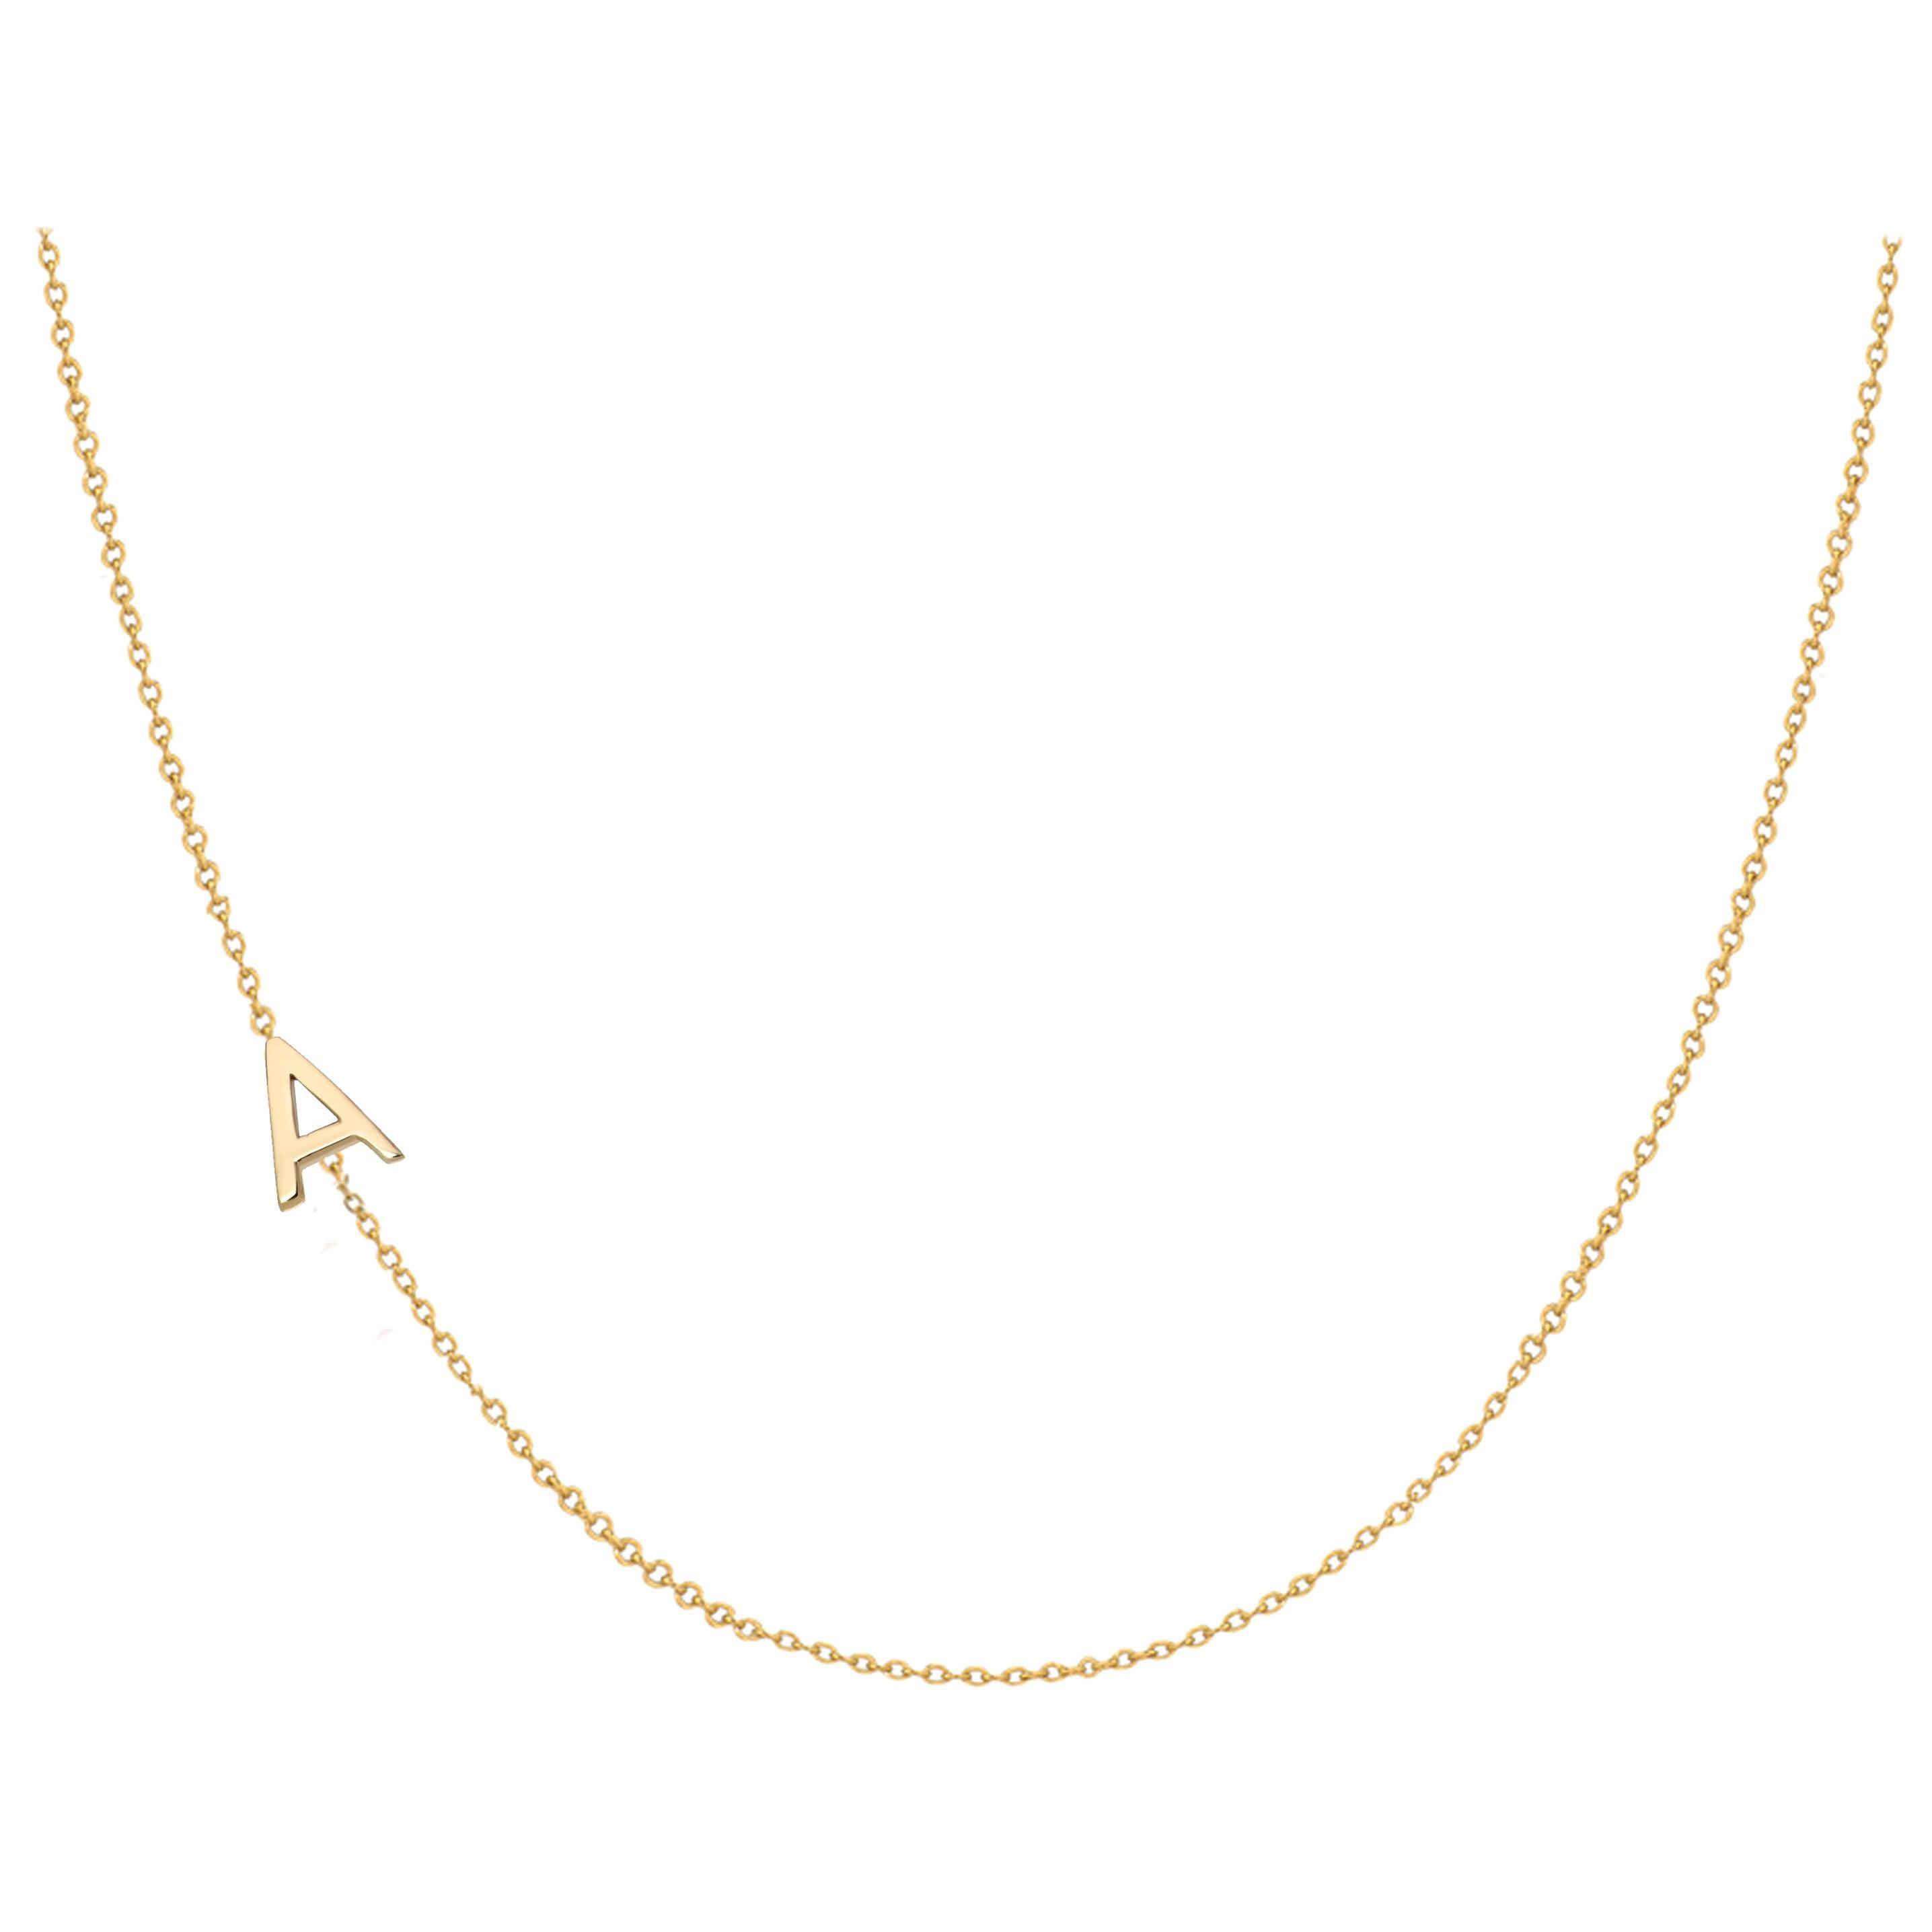 14 Karat Gold Asymmetrical Initial Necklace, A